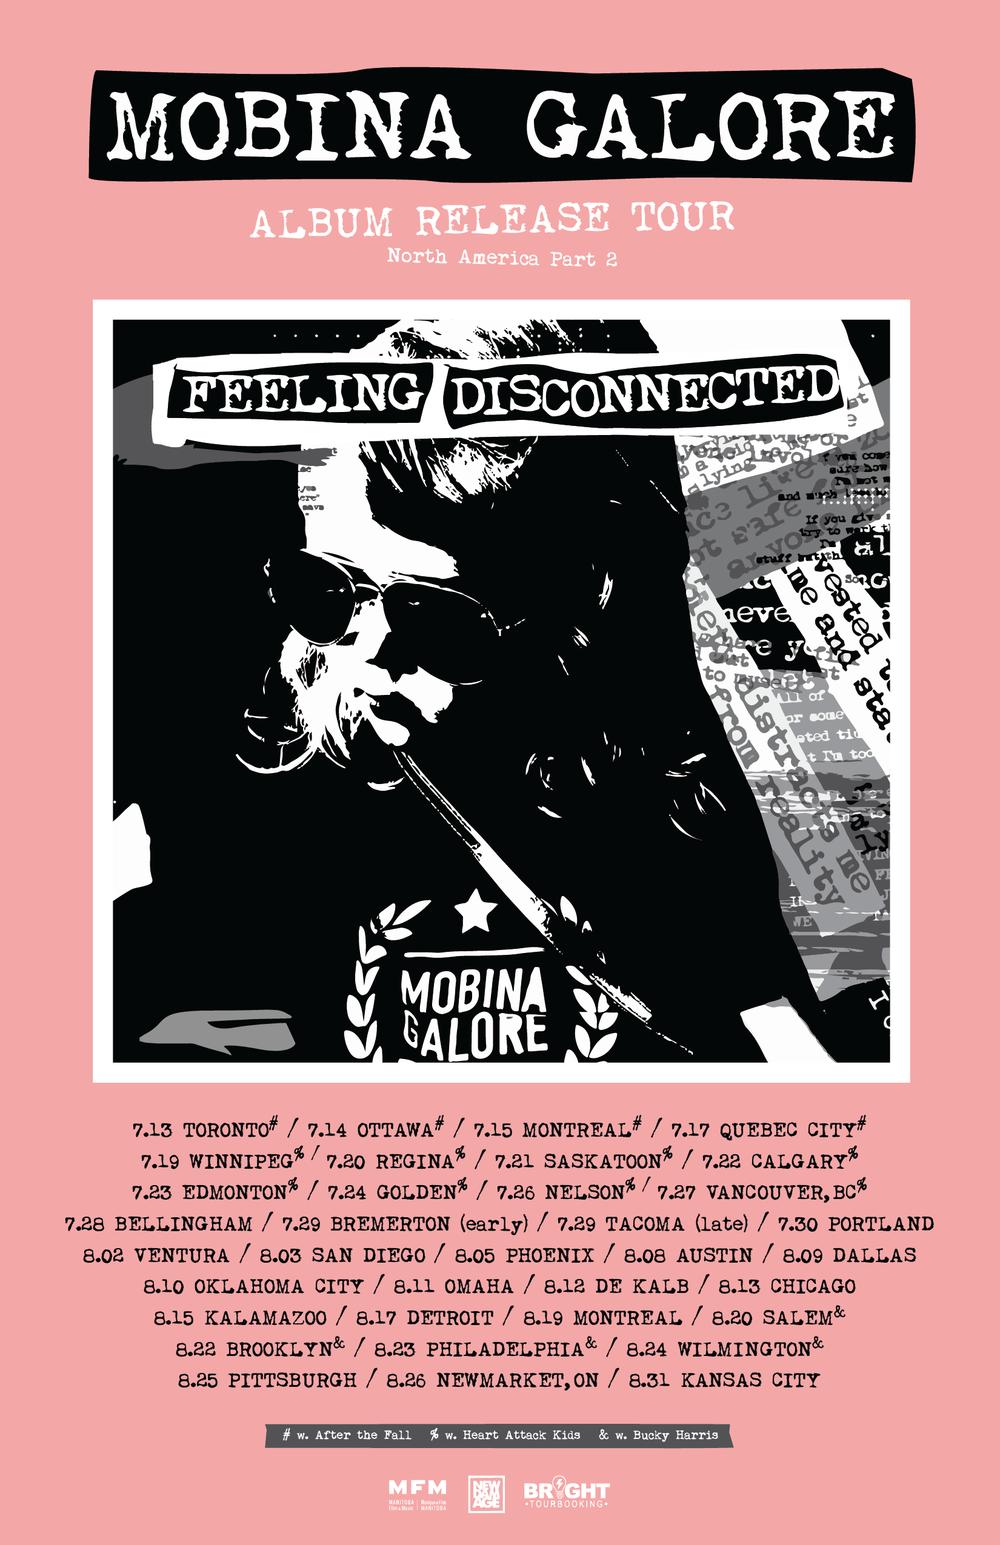 Tour Poster Dates